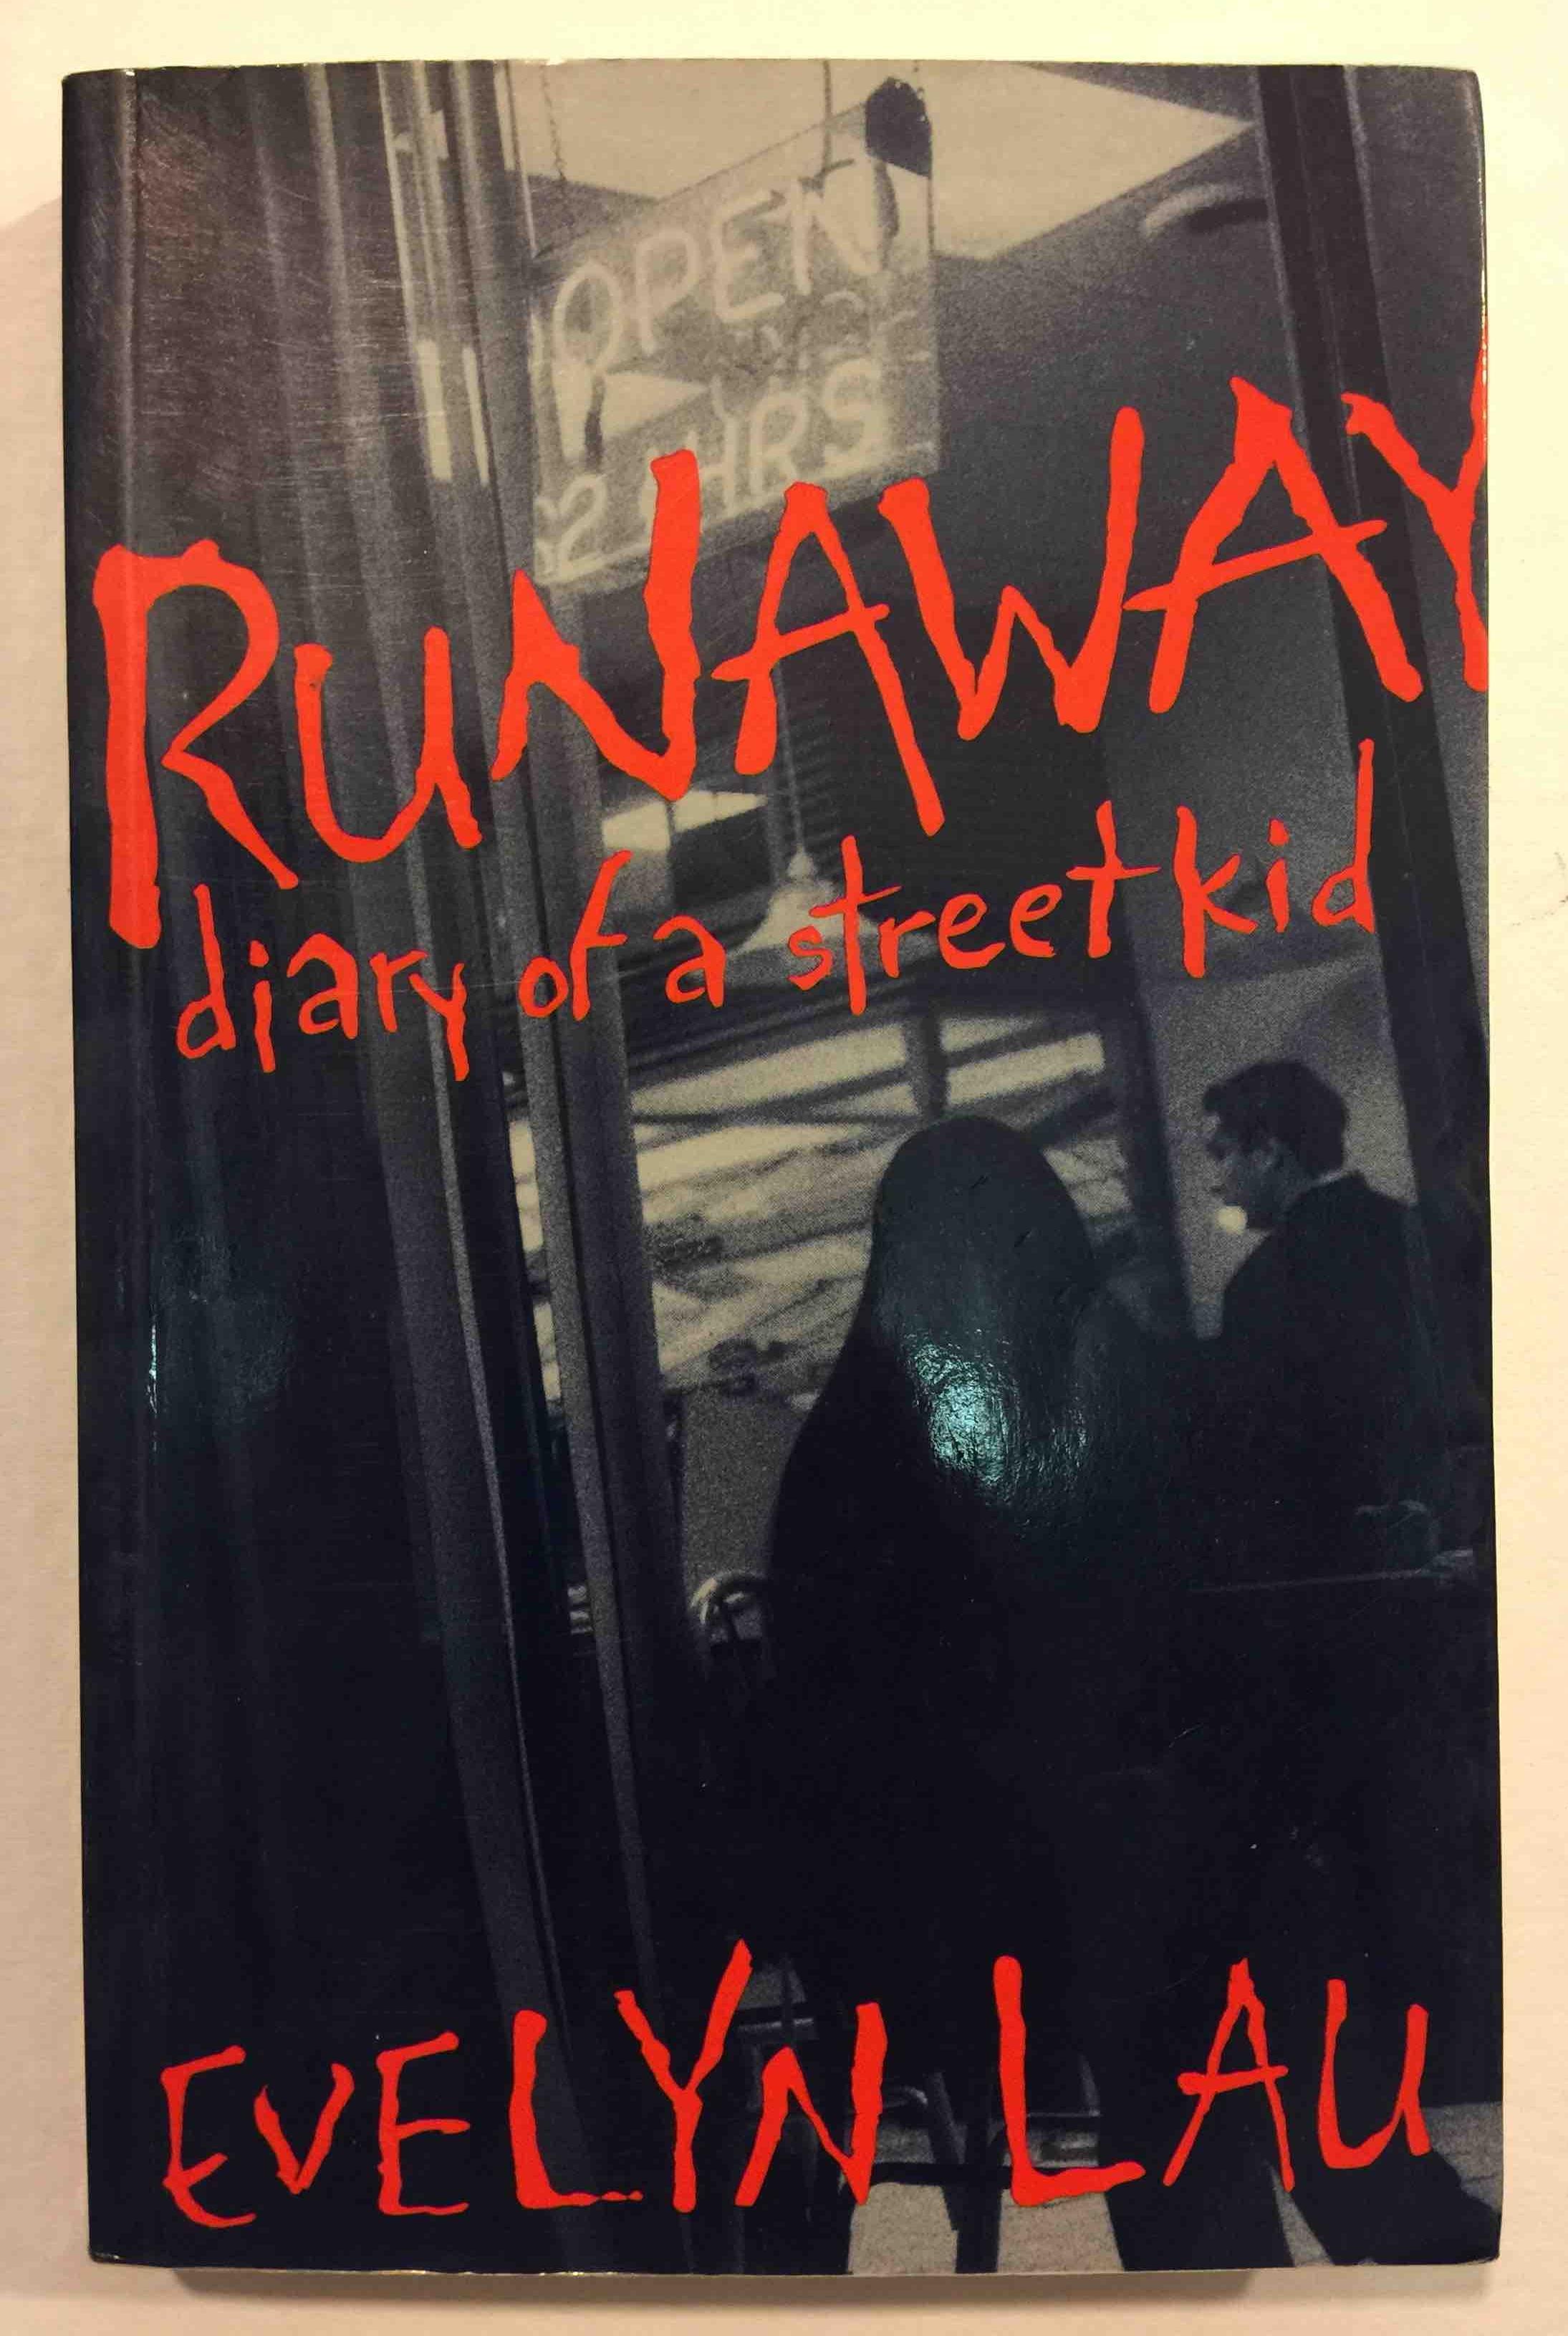 LAU, EVELYN - RUNAWAY, DIARY OF A STREET KID